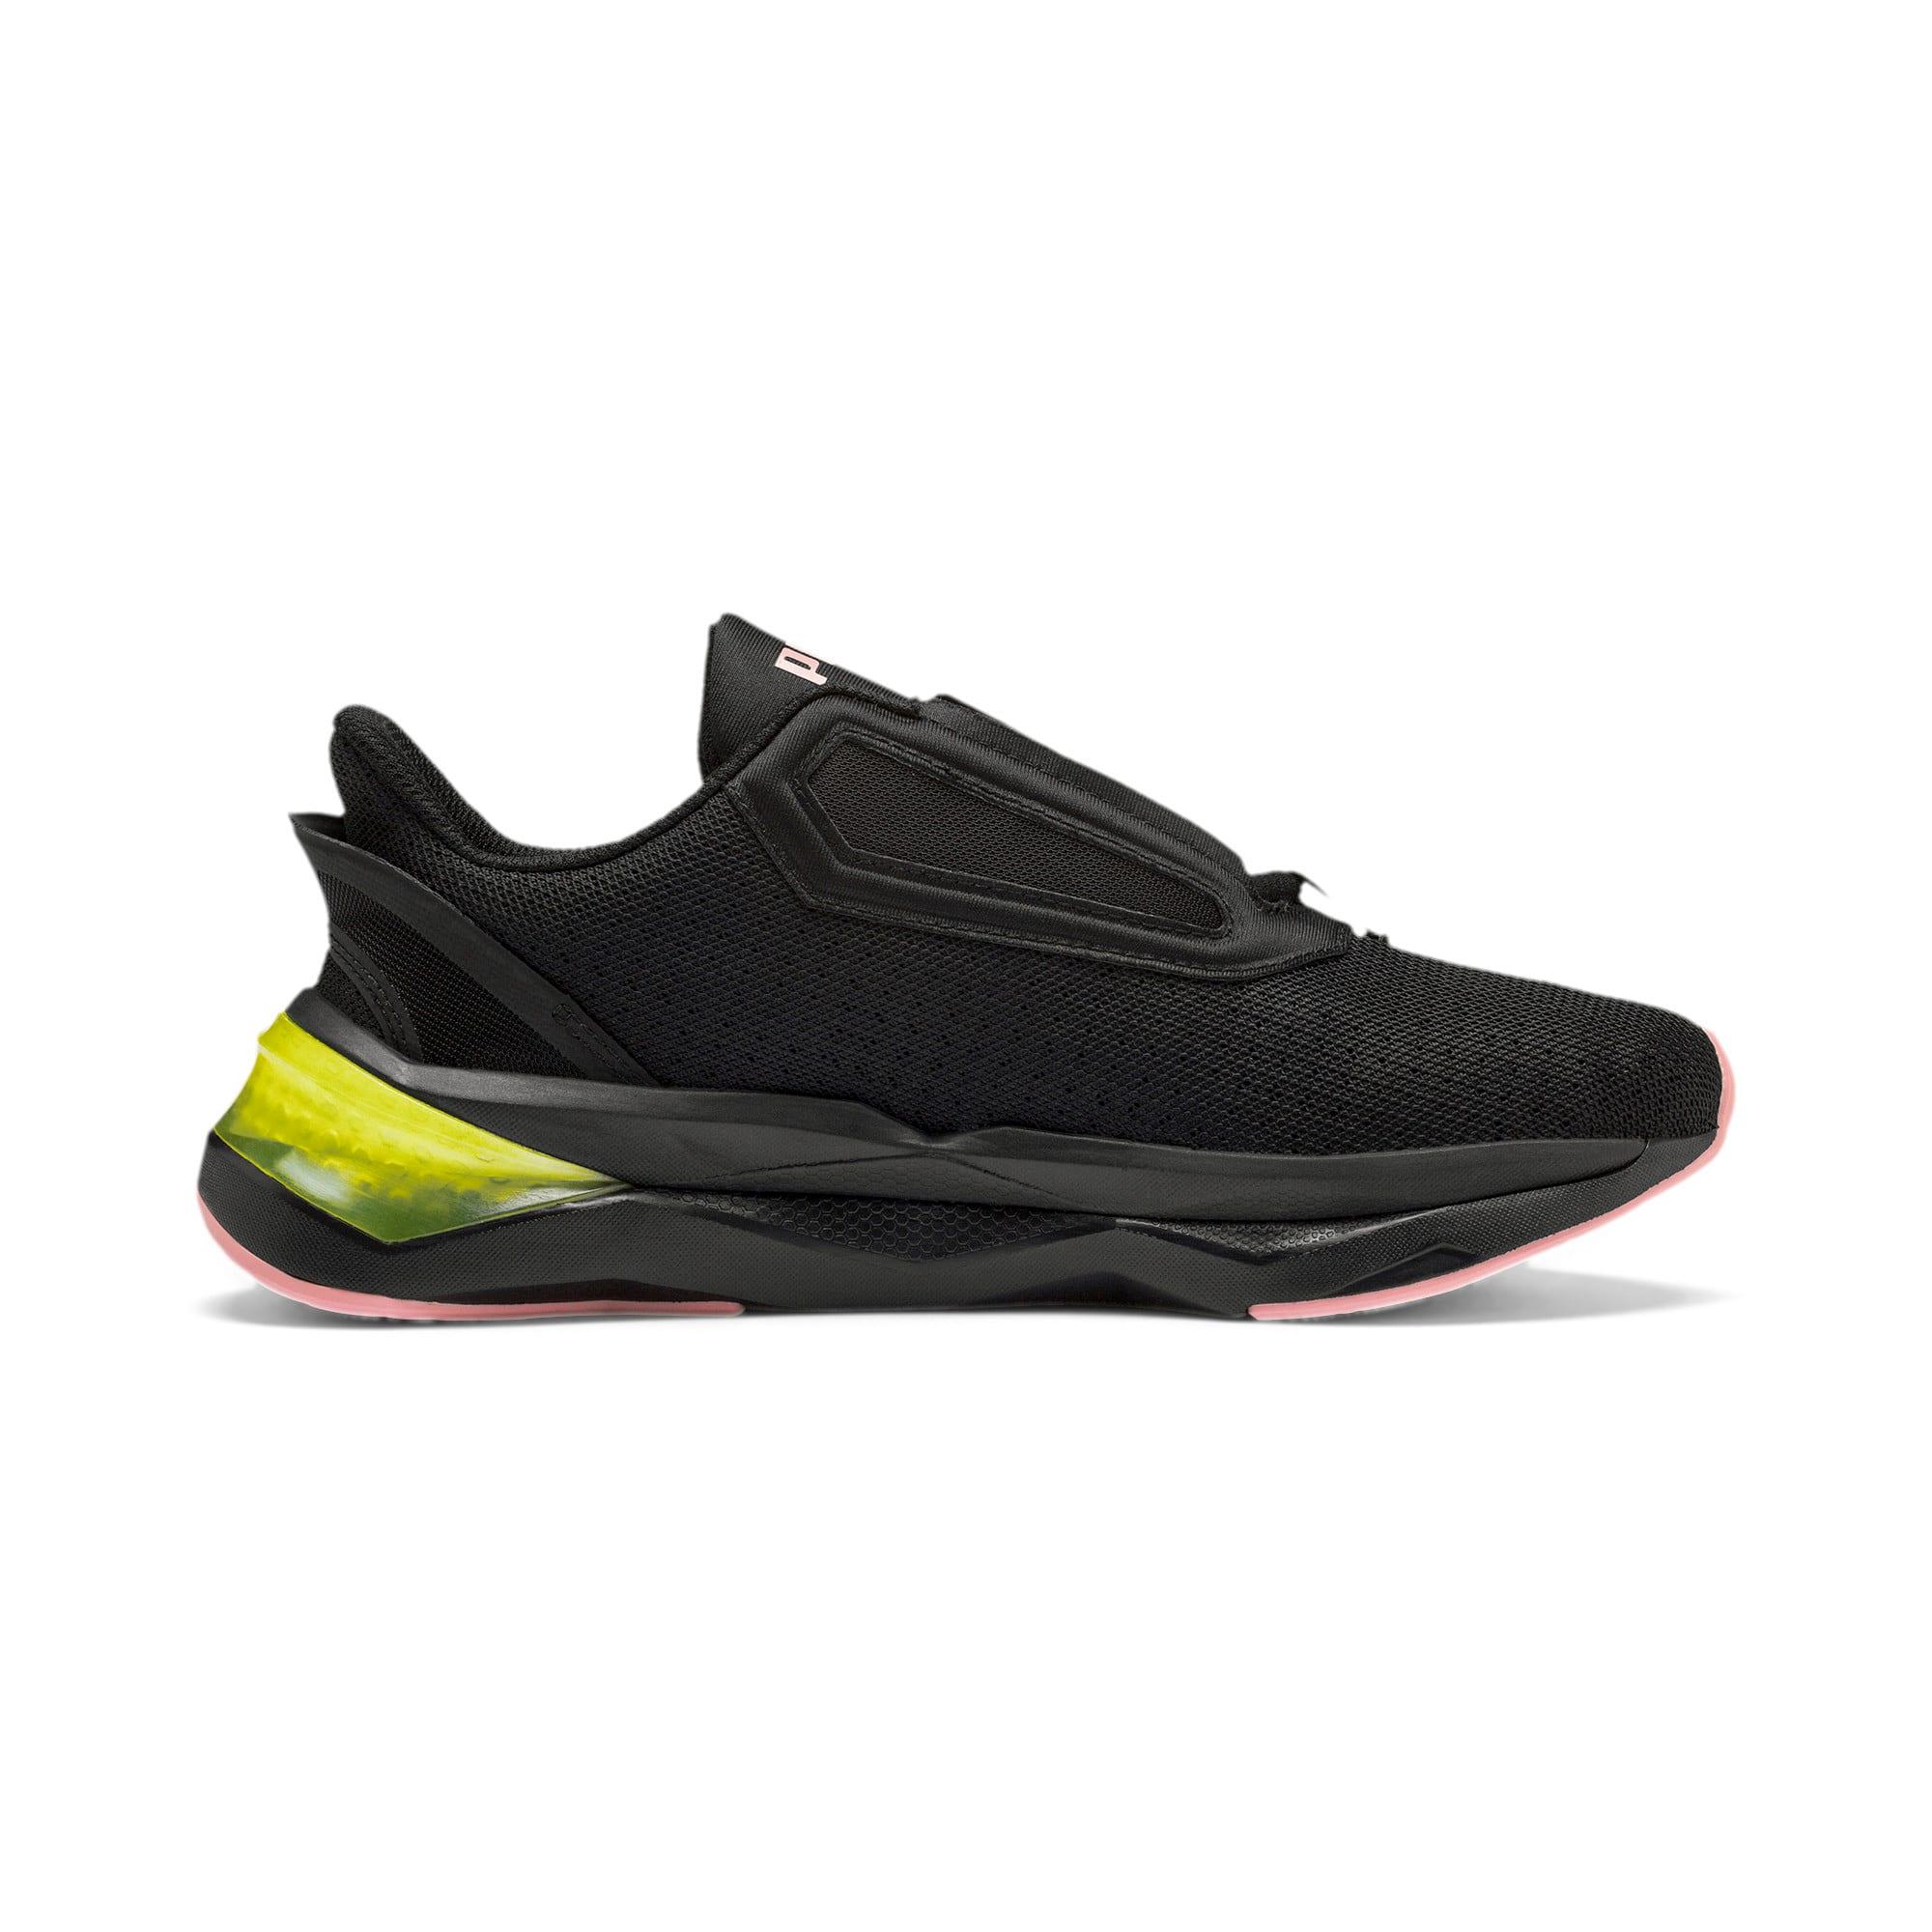 Thumbnail 7 of LQDCELL Shatter XT Women's Training Shoes, Puma Black-Yellow Alert, medium